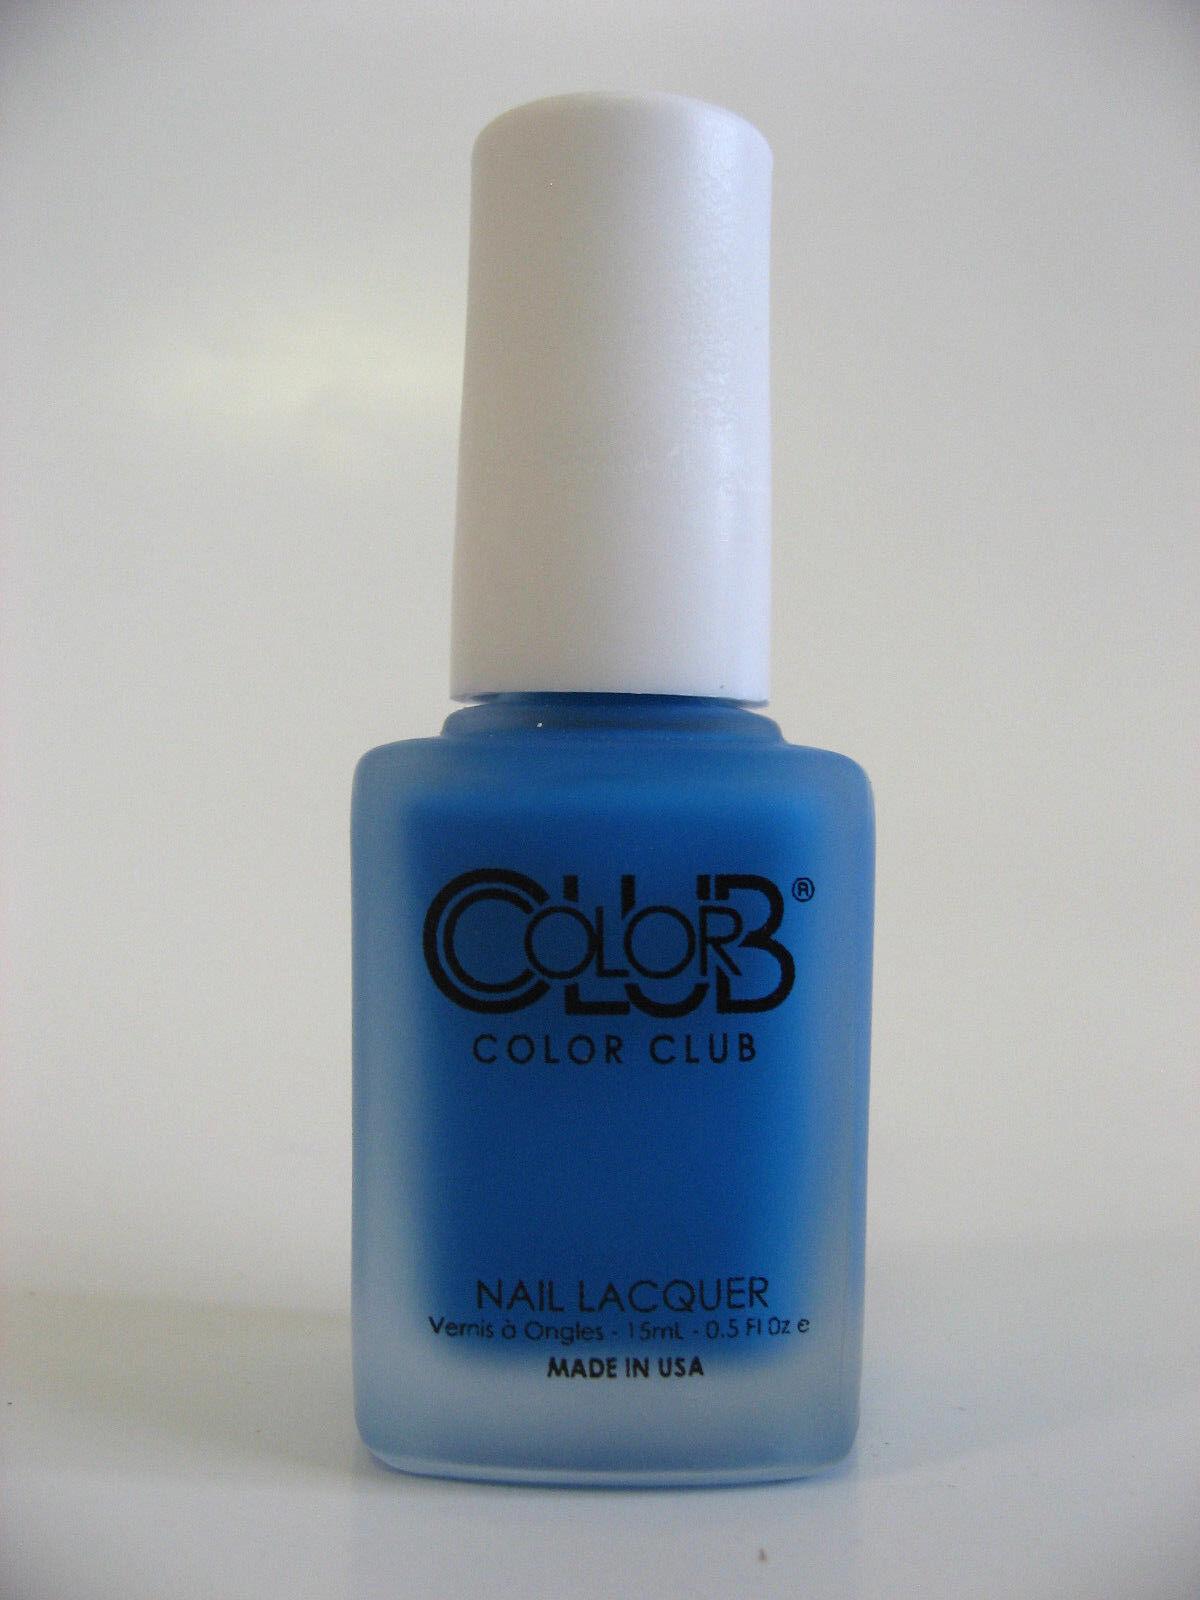 Color Club Nail Lacquer Matte Trapper Keeper Anr21 | eBay